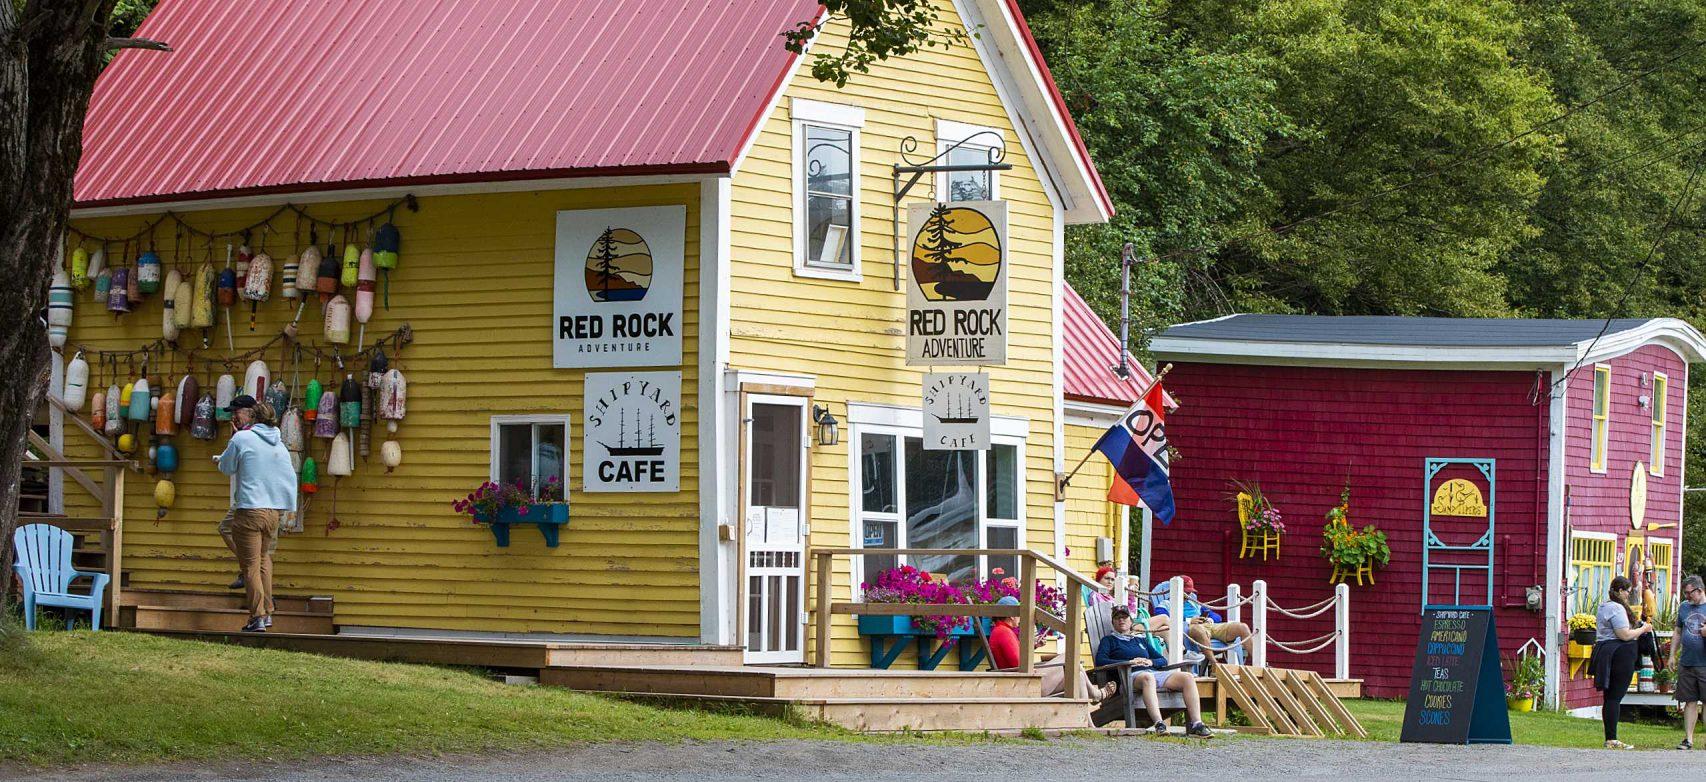 Red Rock Adventure, Shipyard Café, Sandpiper's